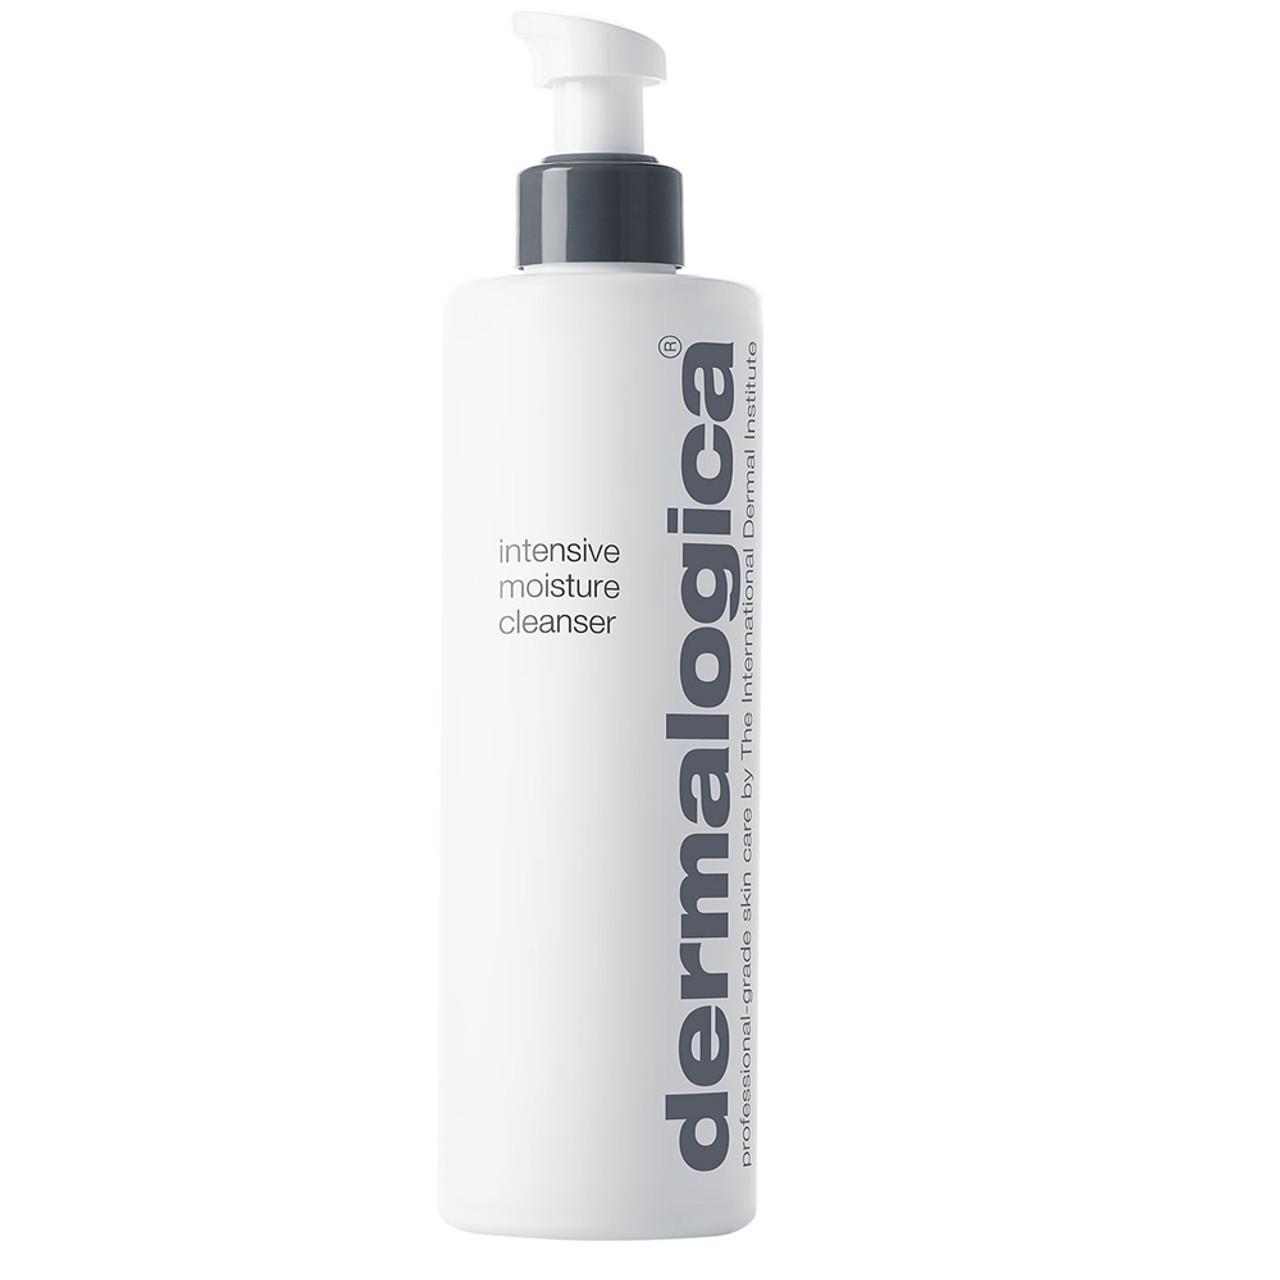 Dermalogica Intensive Moisture Cleanser 5.1 fl oz